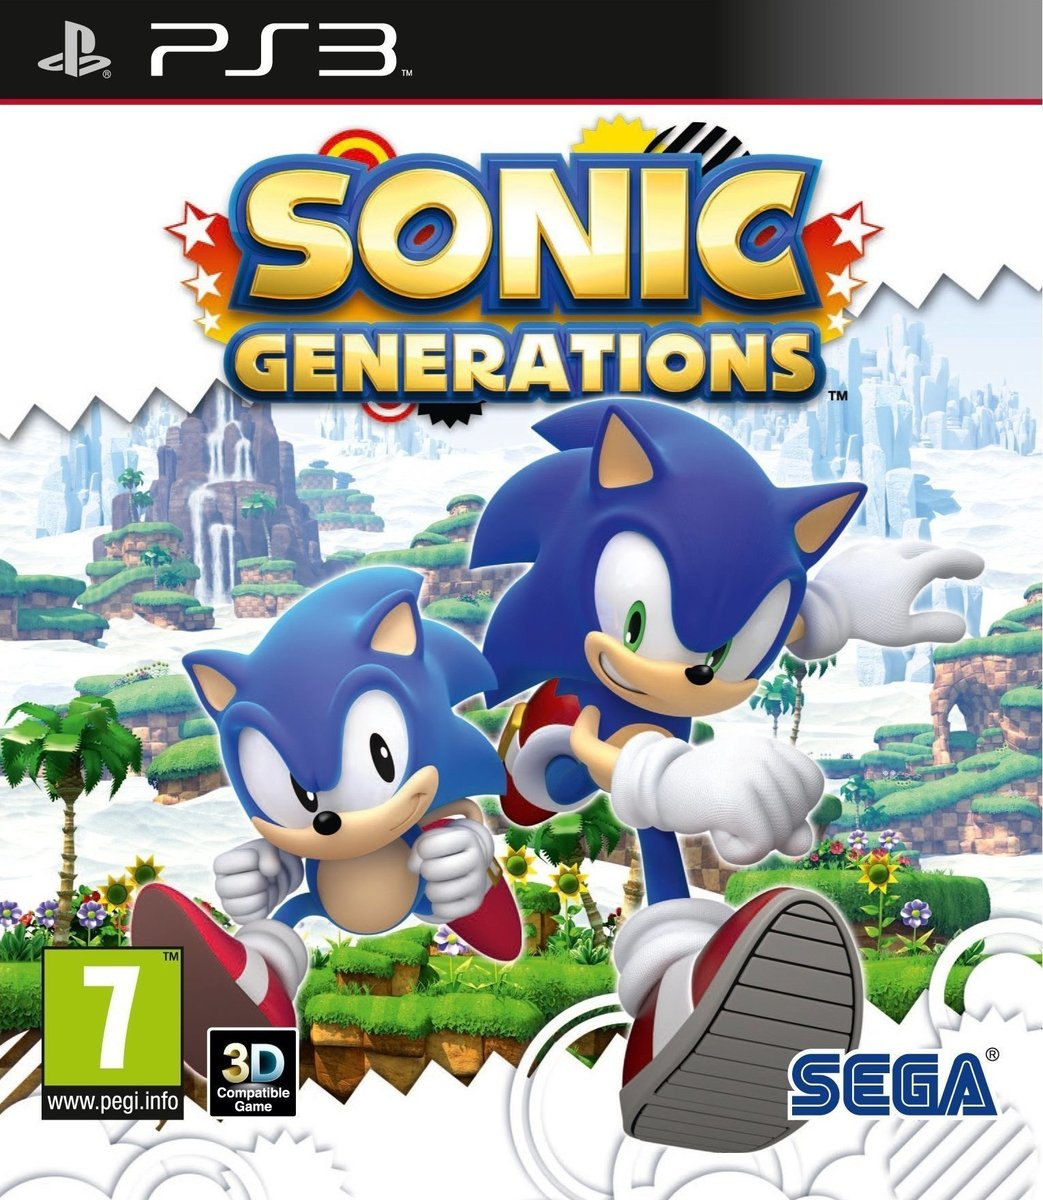 SONIC GENERATIONS PS3 - SEGA 1.14.01.14.002